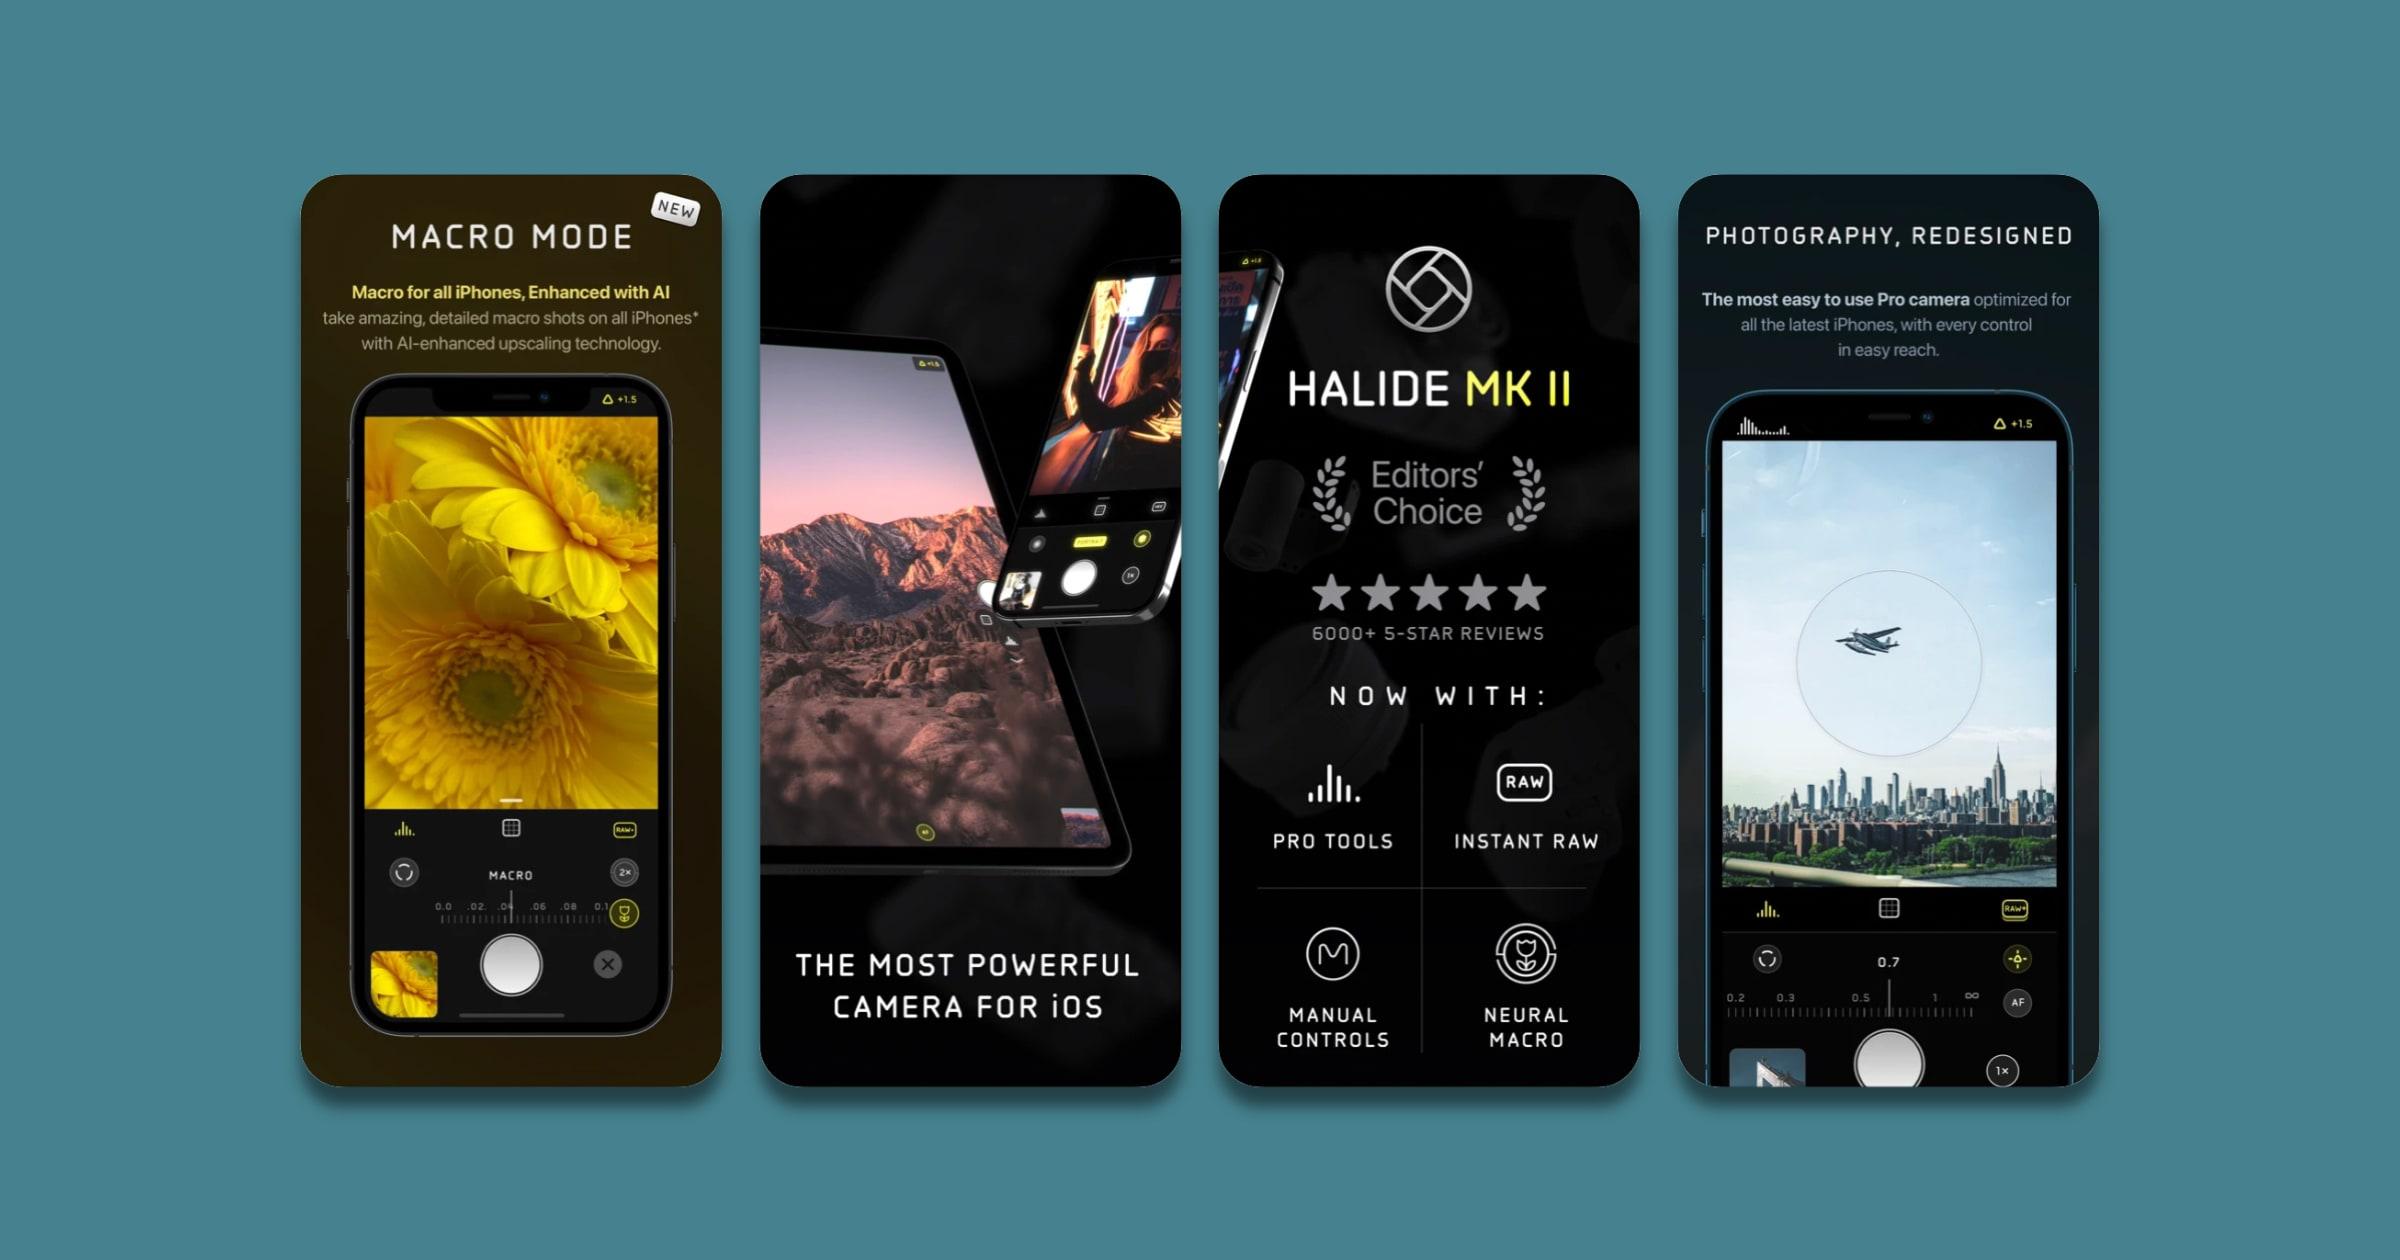 'Halide' Camera Update Brings Macro Photography to More iPhones